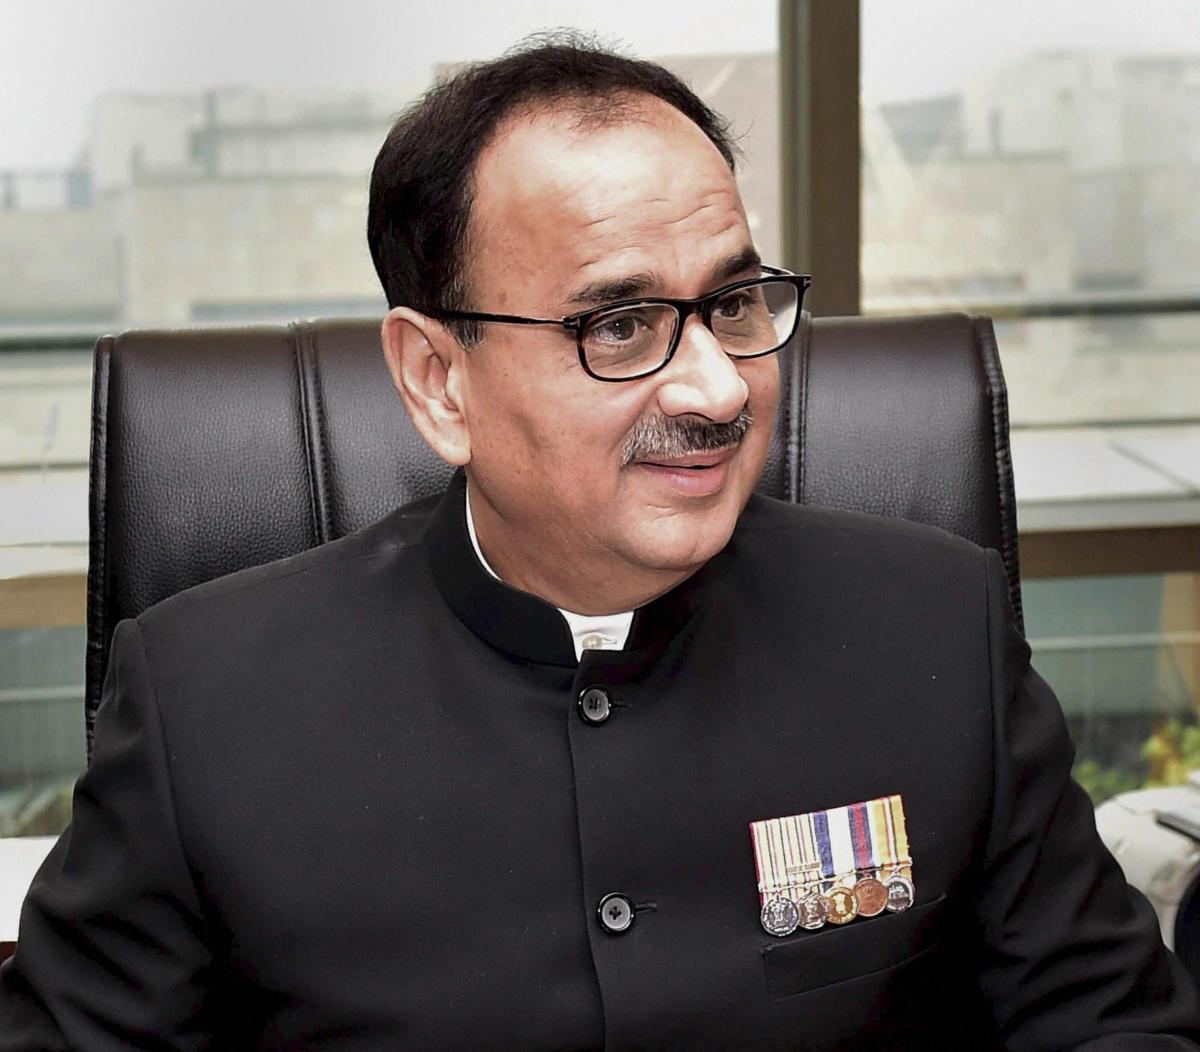 Alok Kumar Verma